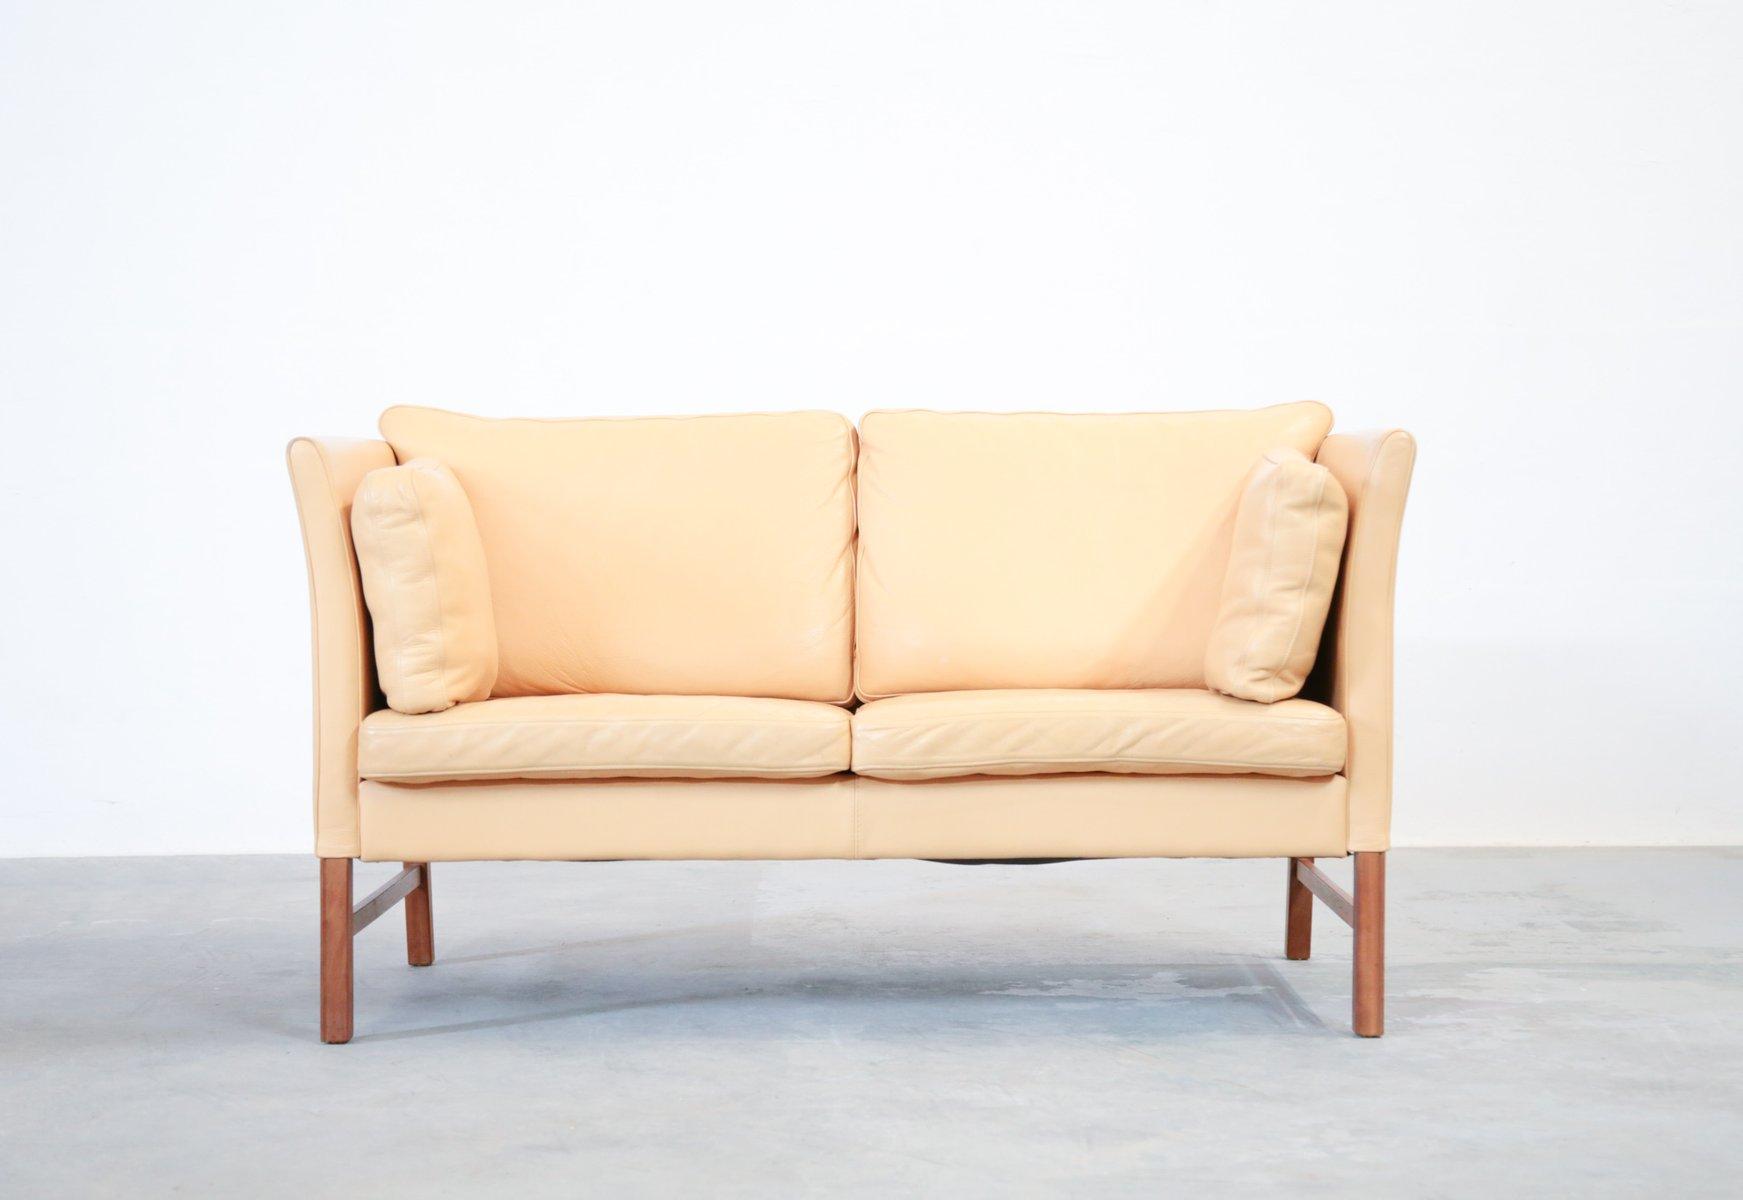 d nisches 2 sitzer ledersofa in beige 1970er bei pamono kaufen. Black Bedroom Furniture Sets. Home Design Ideas